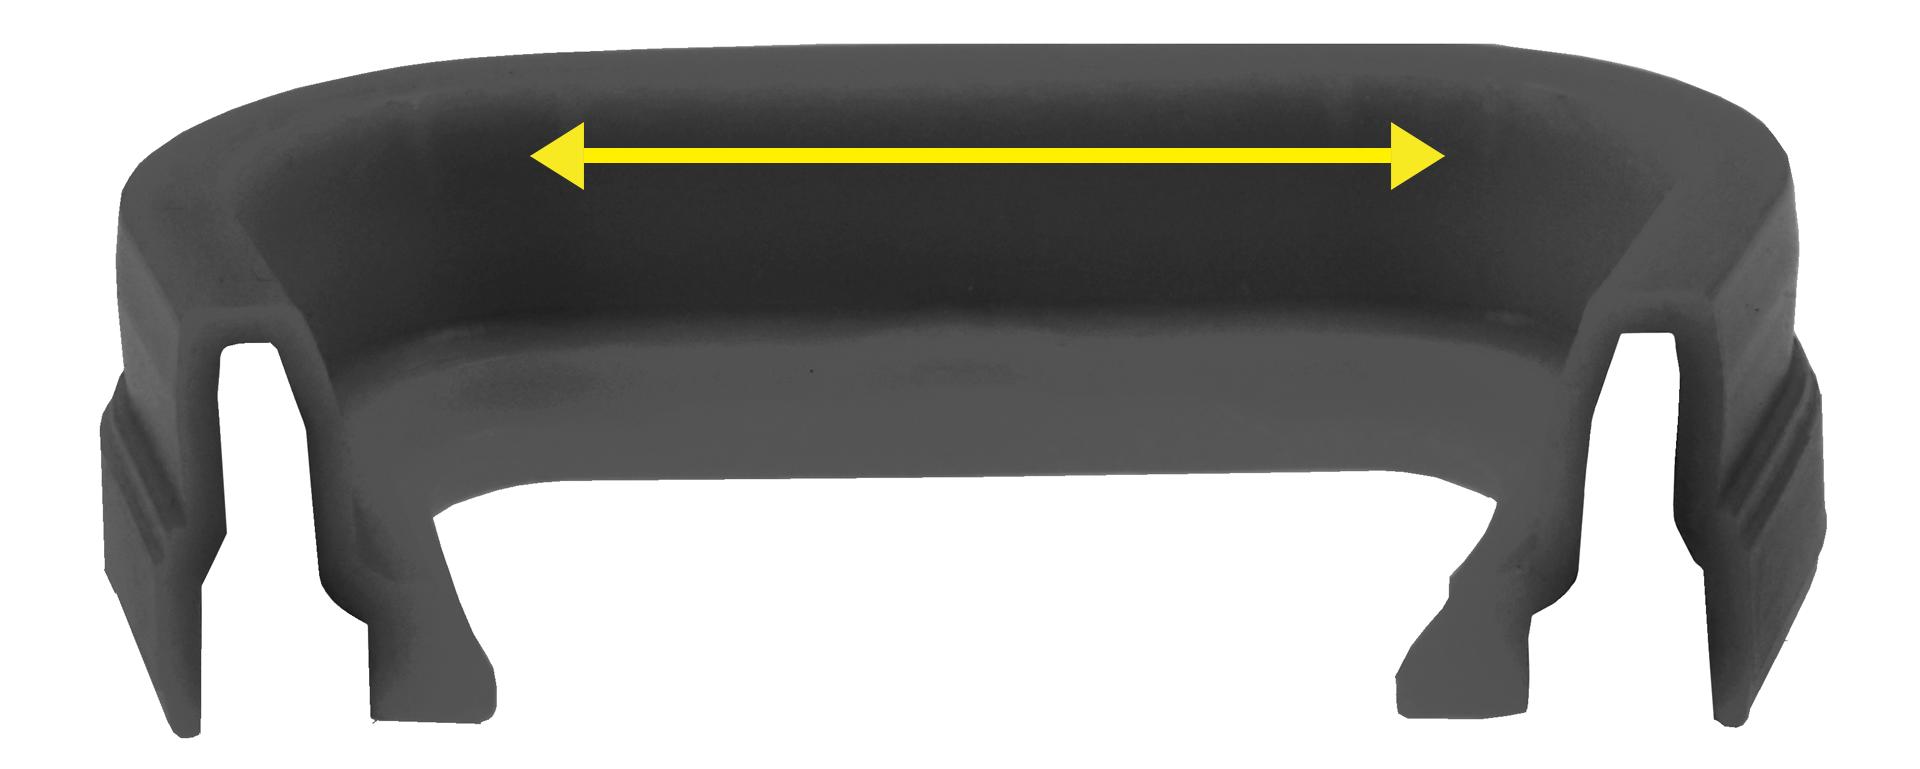 expandieren-labioniq-dentalprodukte